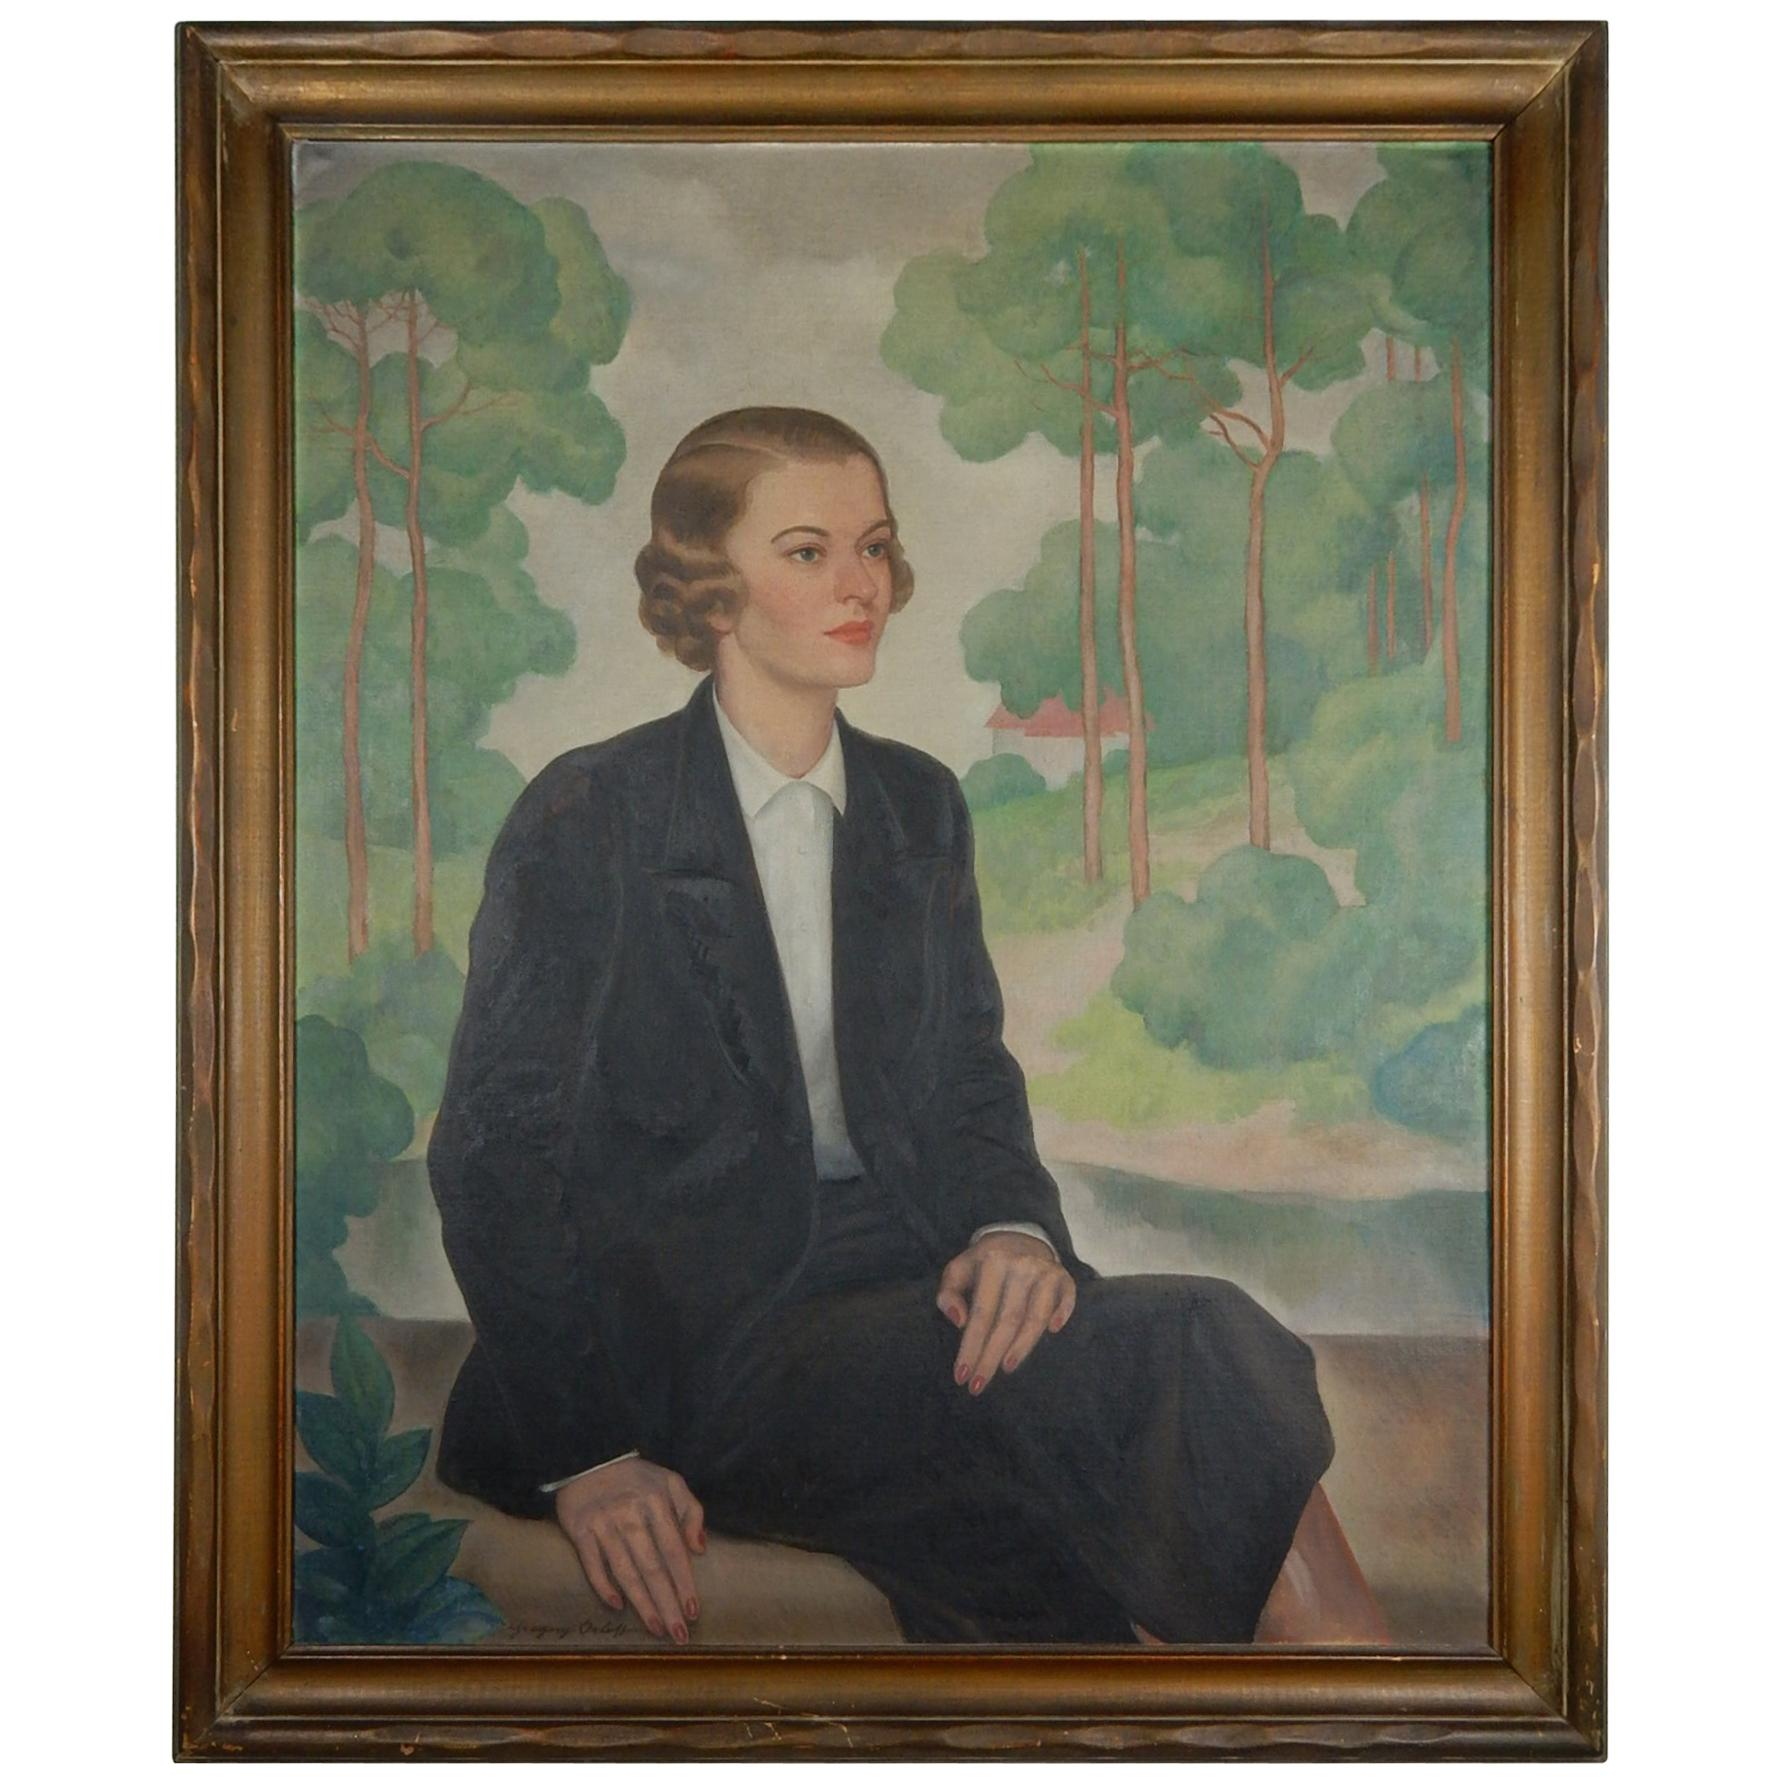 Artist Gregory Orloff (1890-1981) Large Aristocrat Women Portrait Painting